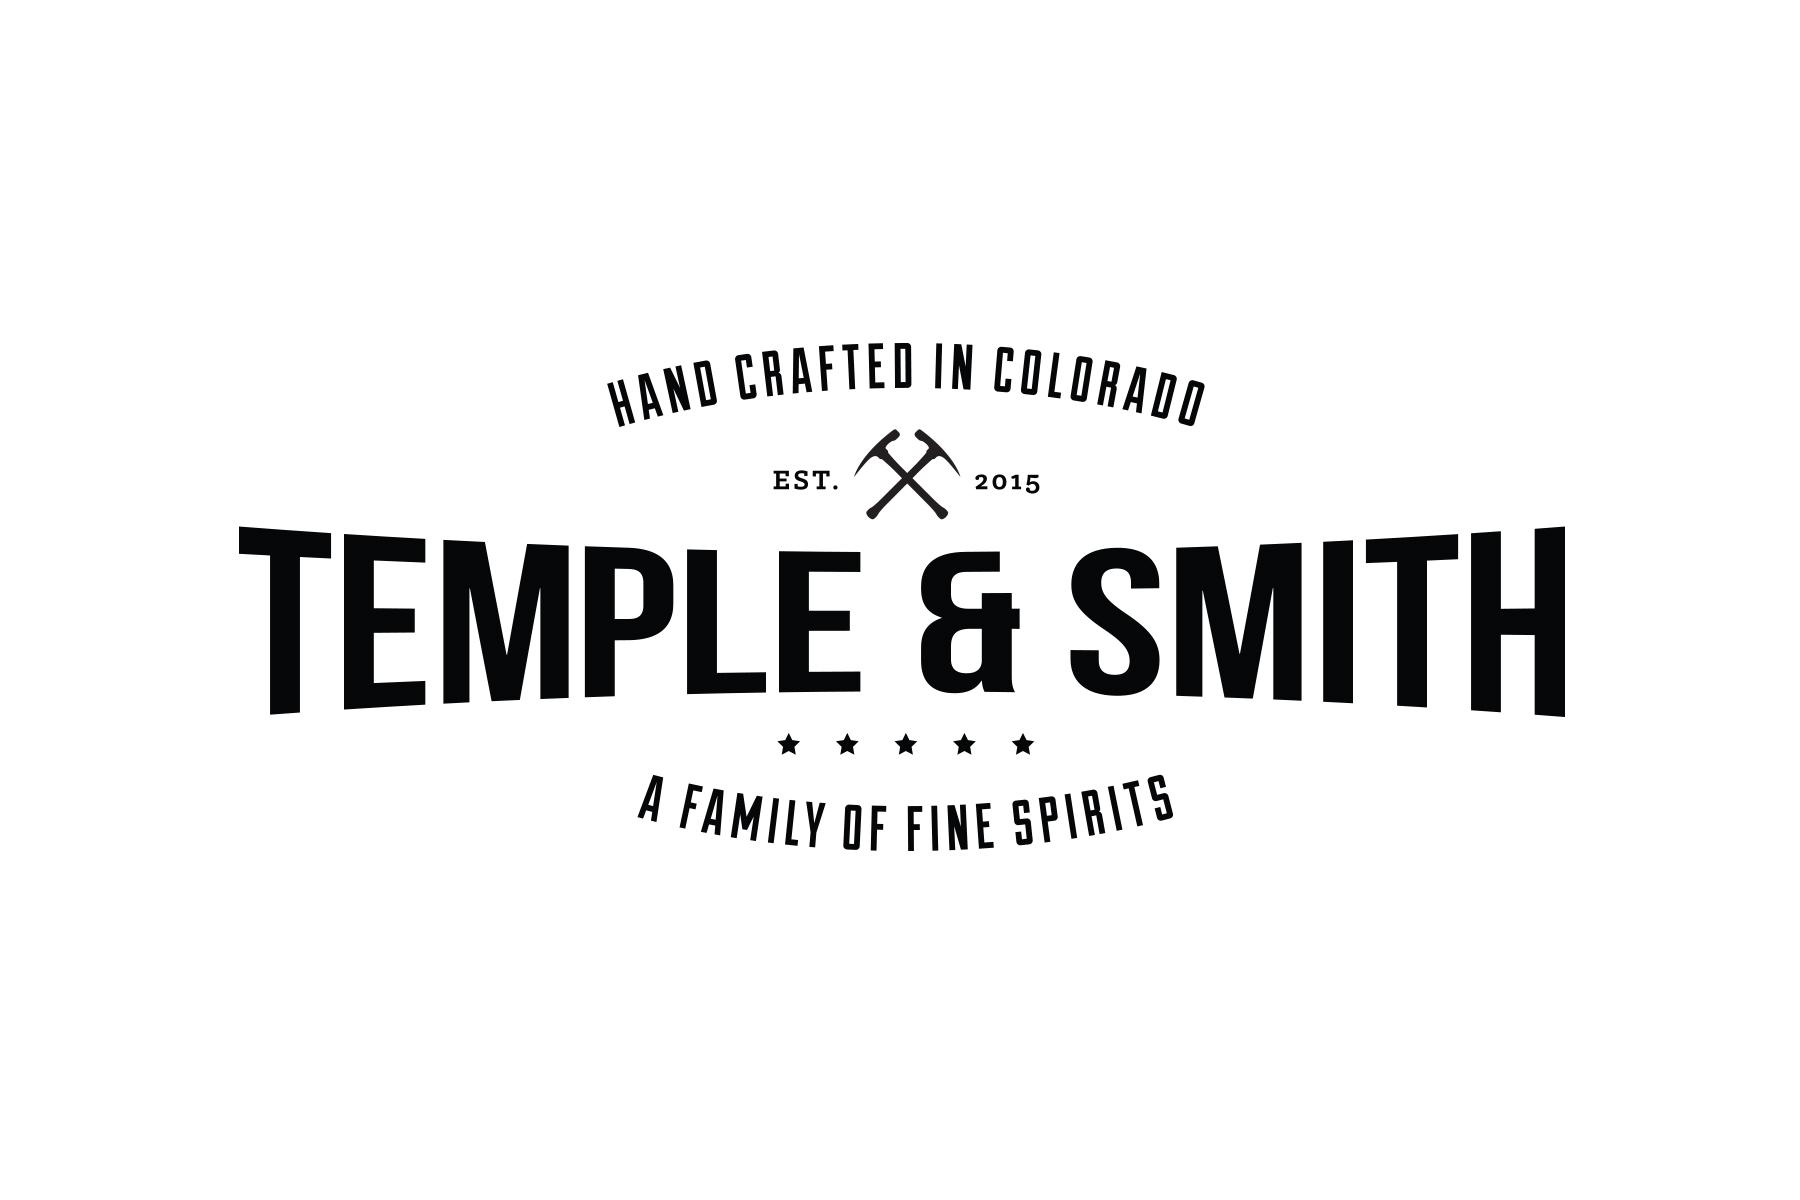 TempleSmith_6x4_ALT2.jpg